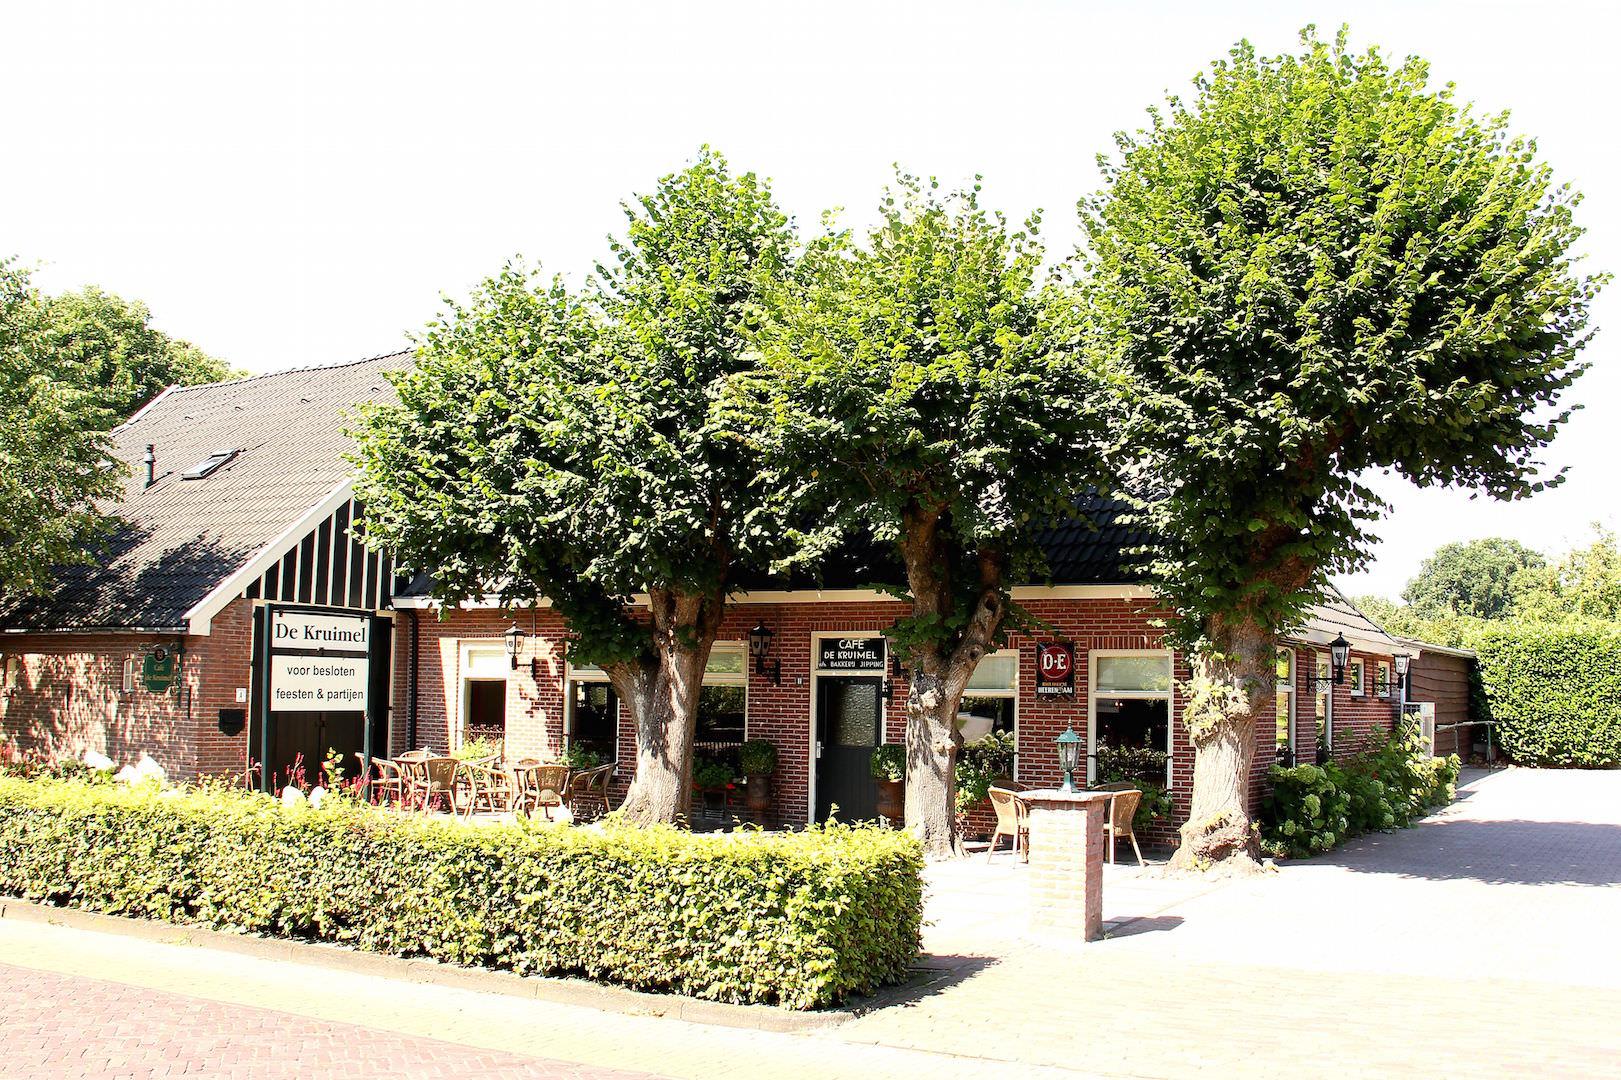 De Kruimel Trouwlocatie Drenthe De Kruimel